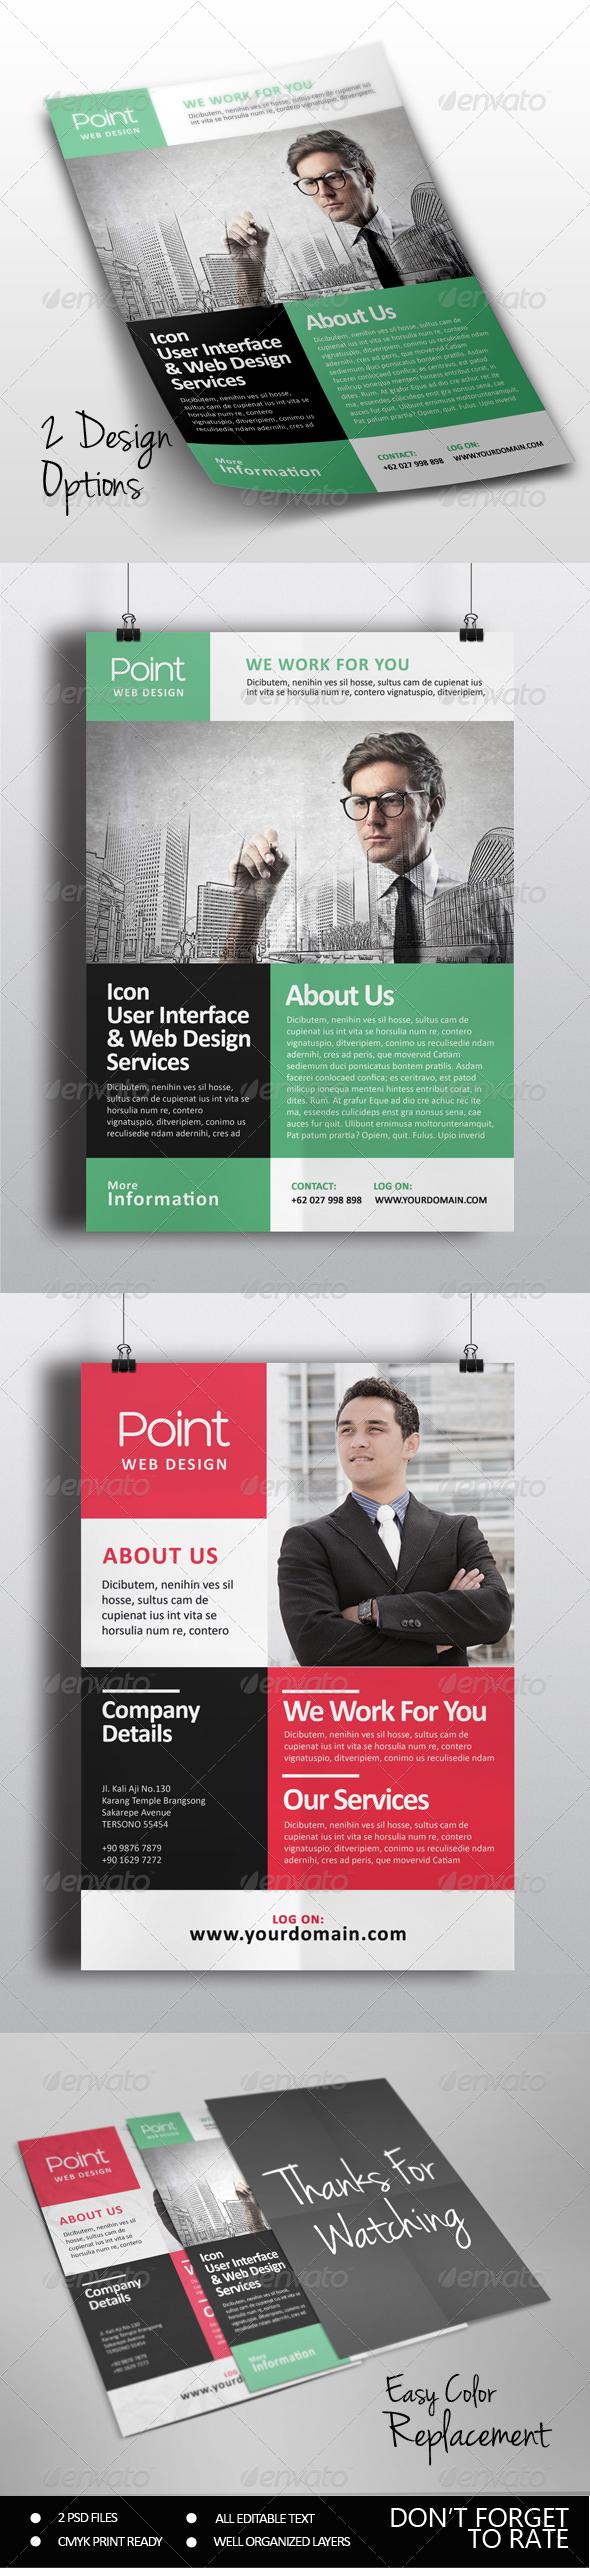 GraphicRiver Multipurpose Business Flyer Vol 3 7741619